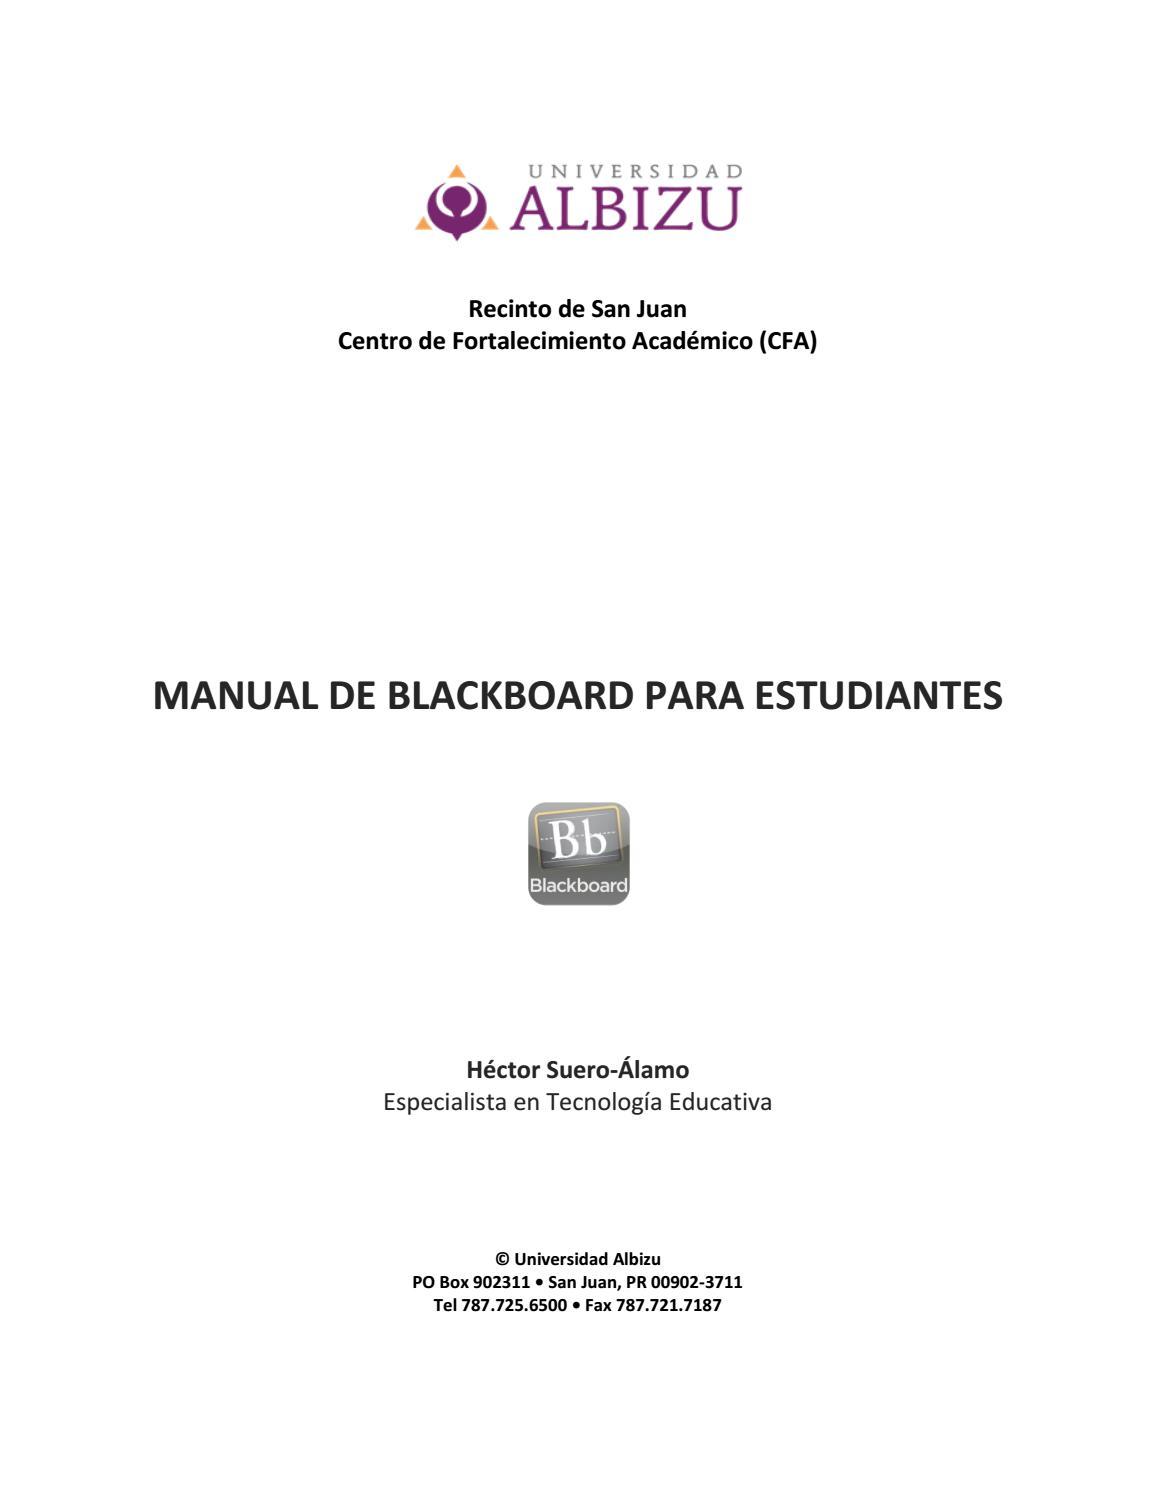 Blackboard magazines.